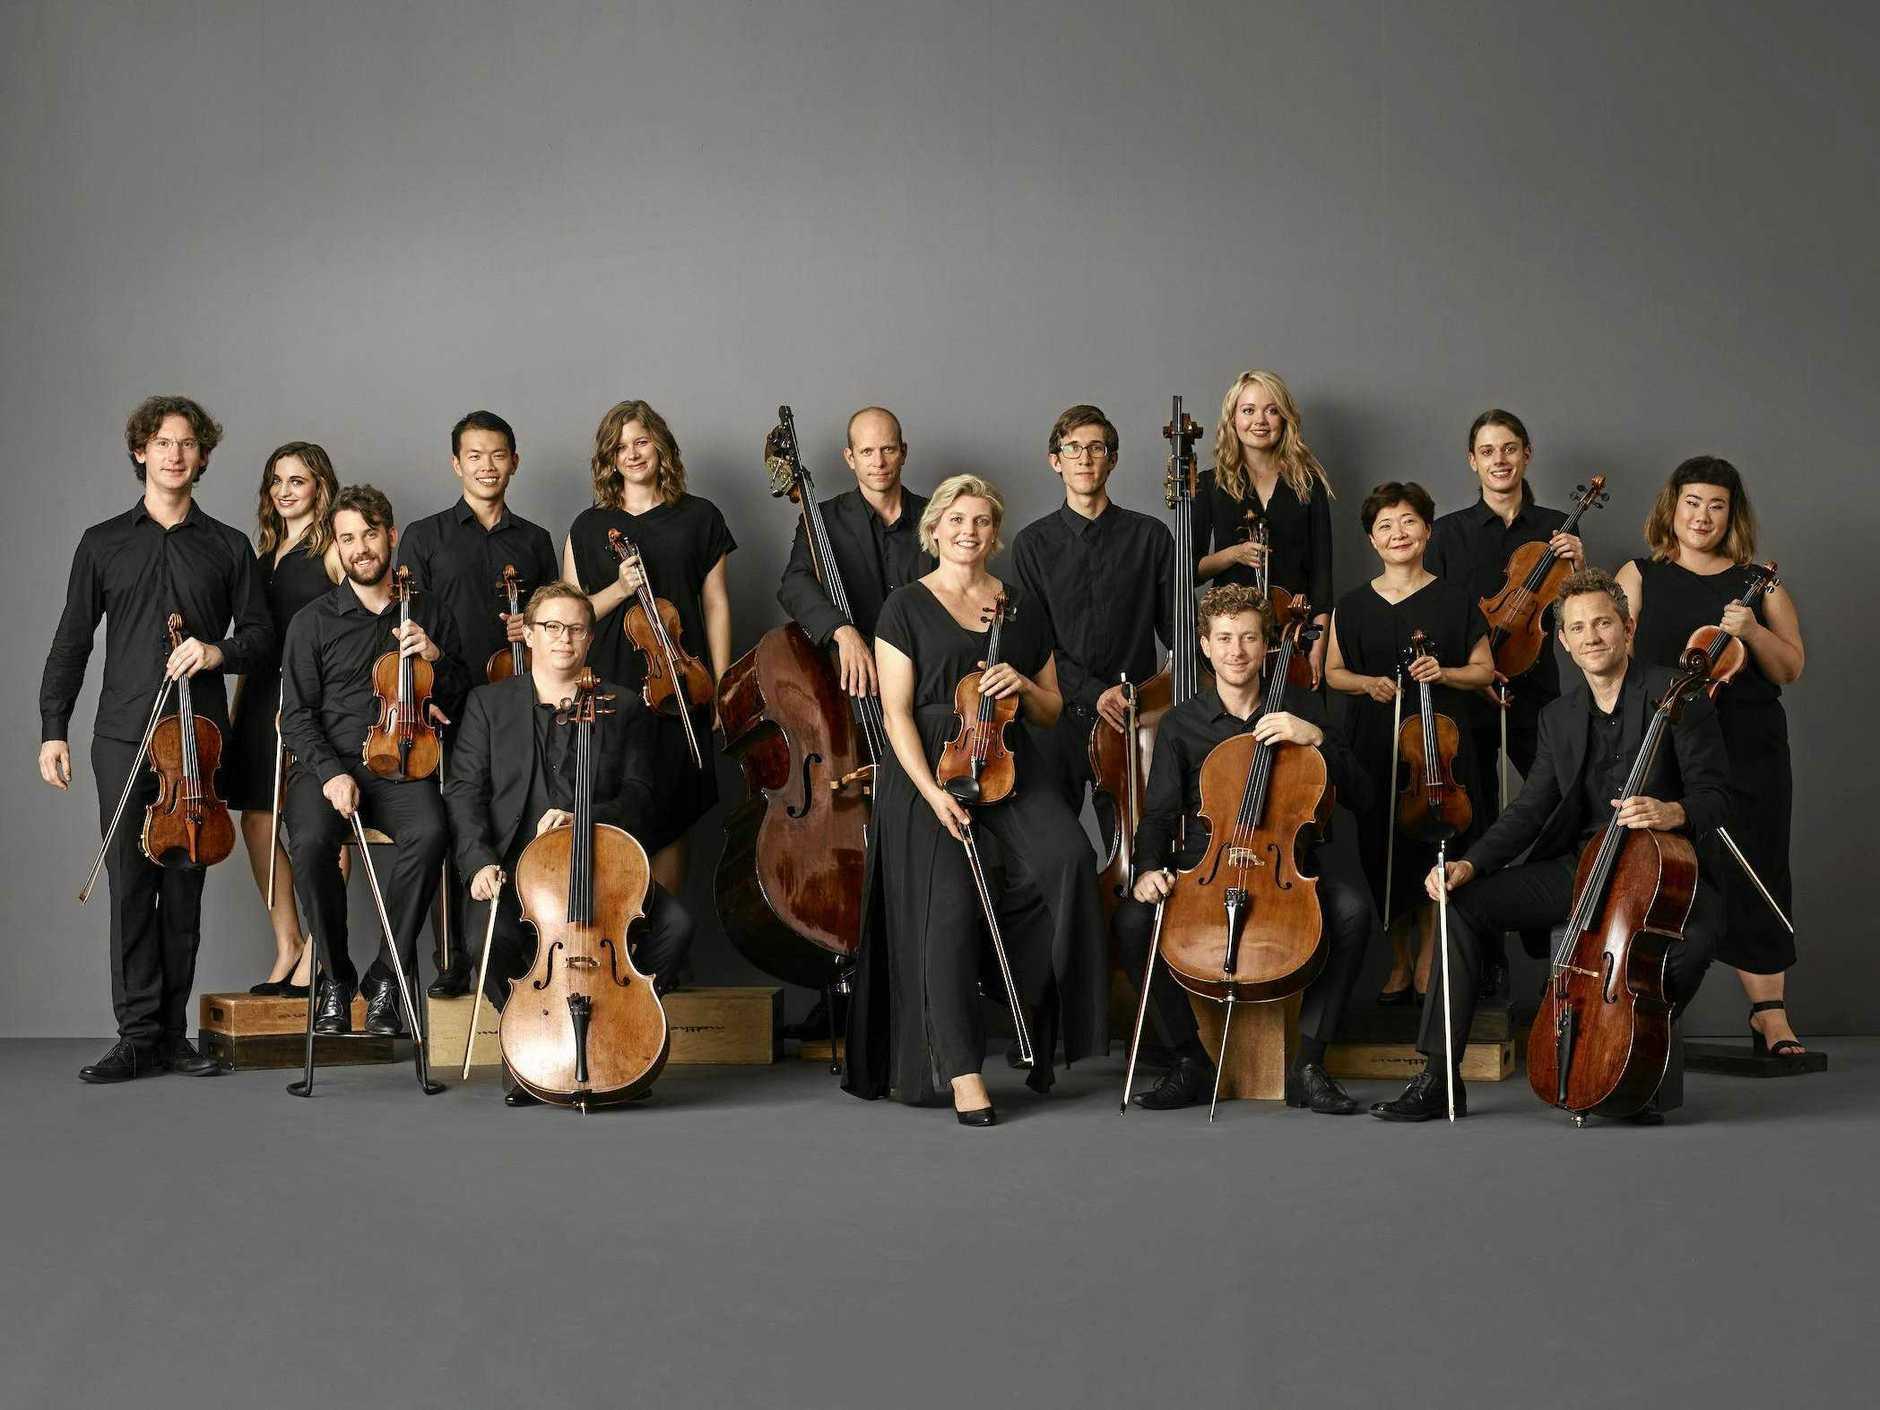 Australian Chamber Orchestra Collective featuring ACO Principal Violin Helena Rathbone.